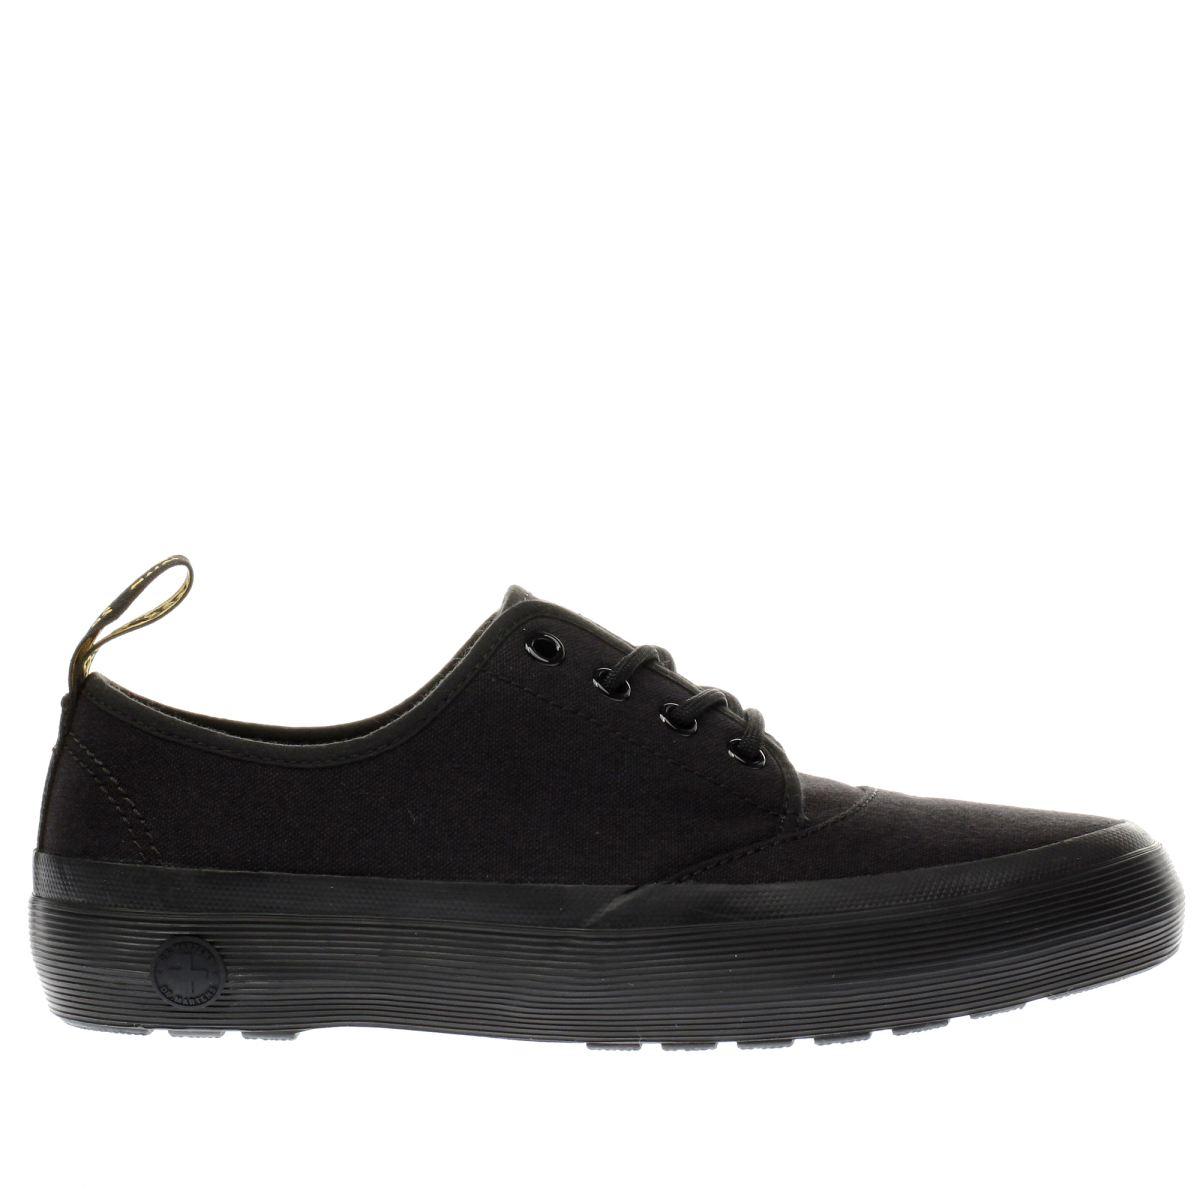 dr martens black jacy 4 eye flat shoes